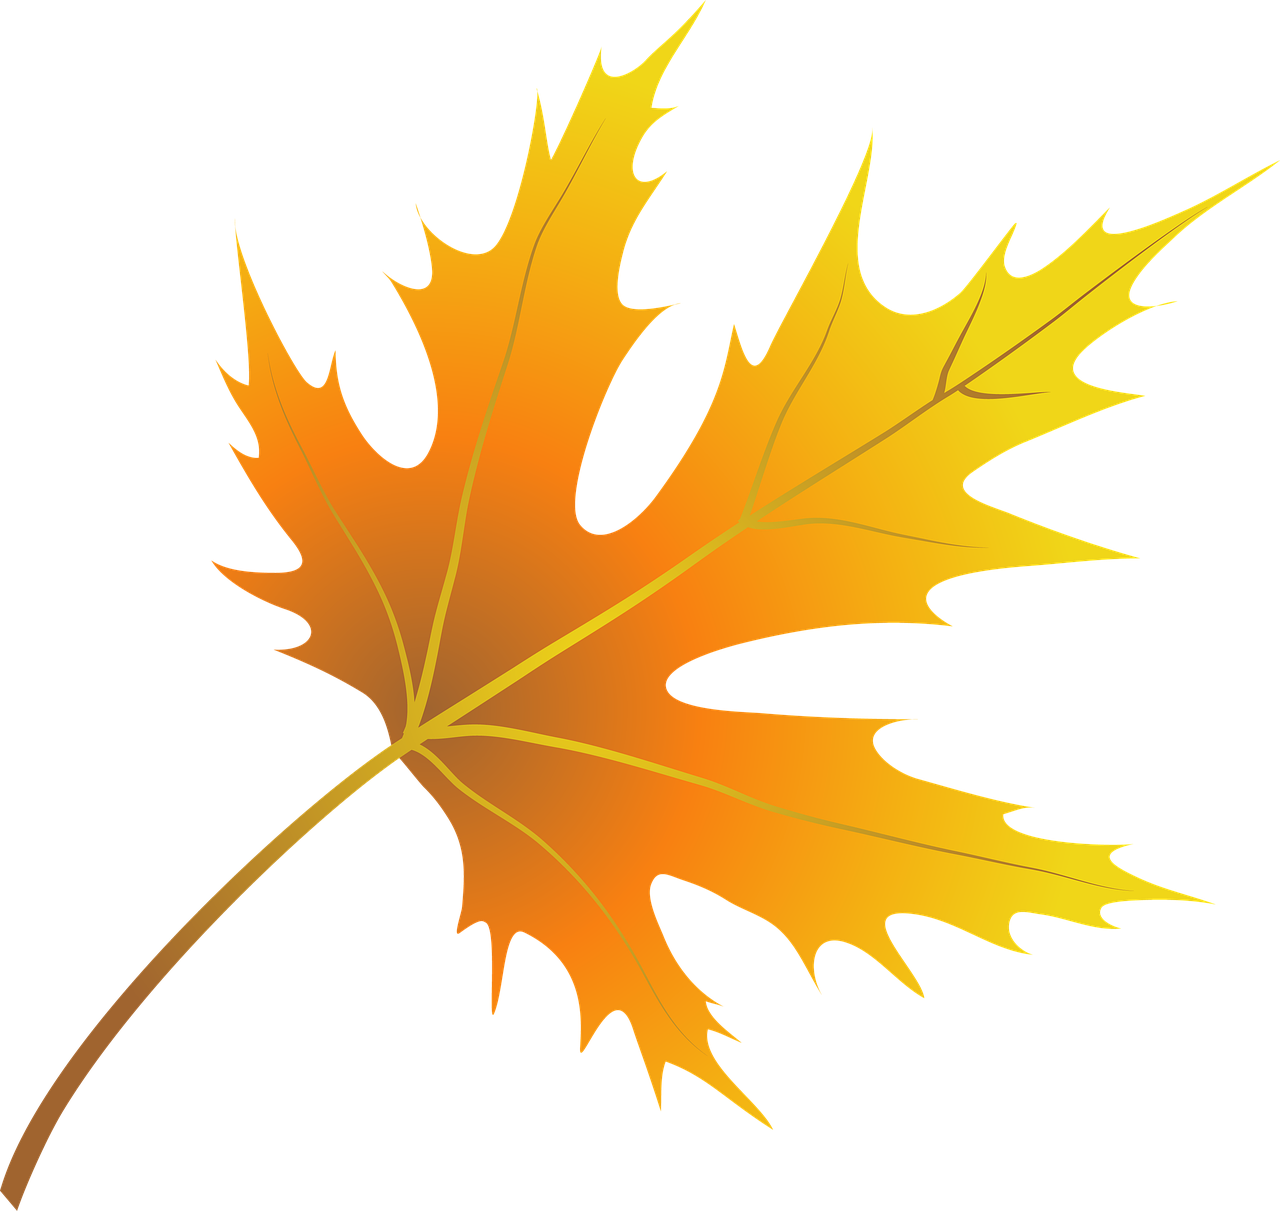 Opis: Autumn Leaves Skeleton Leaf - Free image on Pixabay